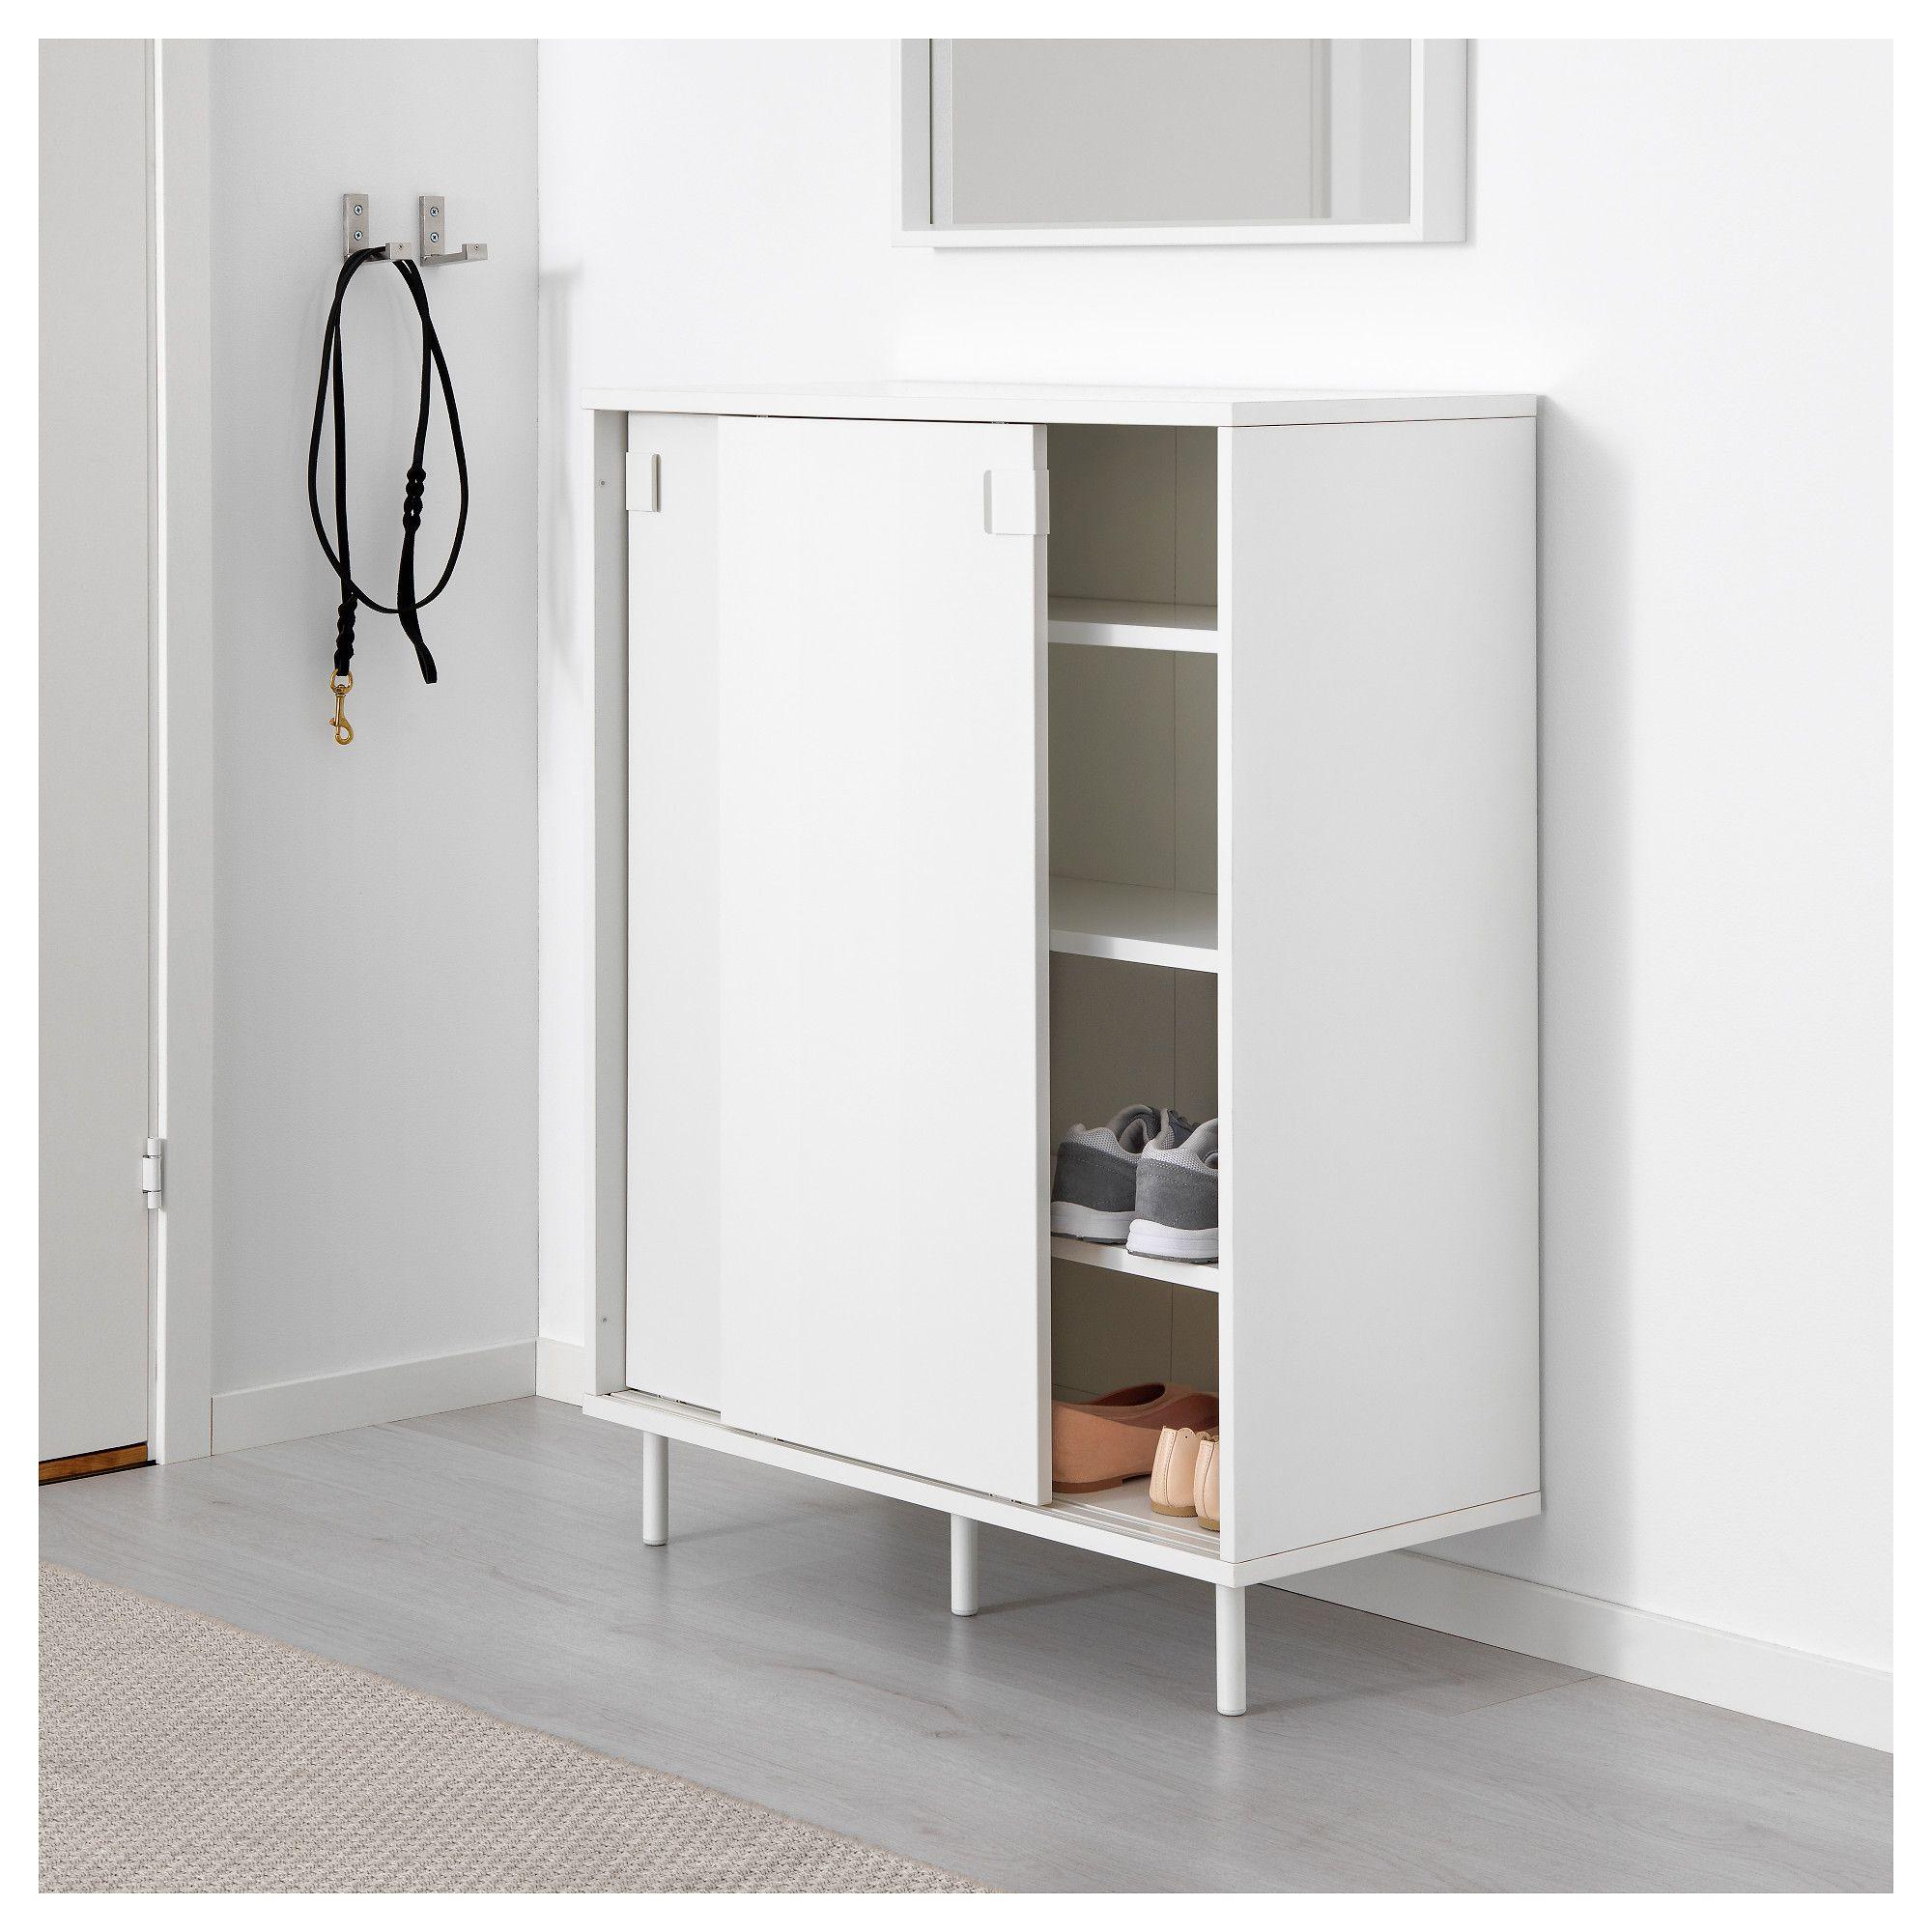 Best Ikea Mackapär Shoe Storage Cabinet Ikea Storage 400 x 300